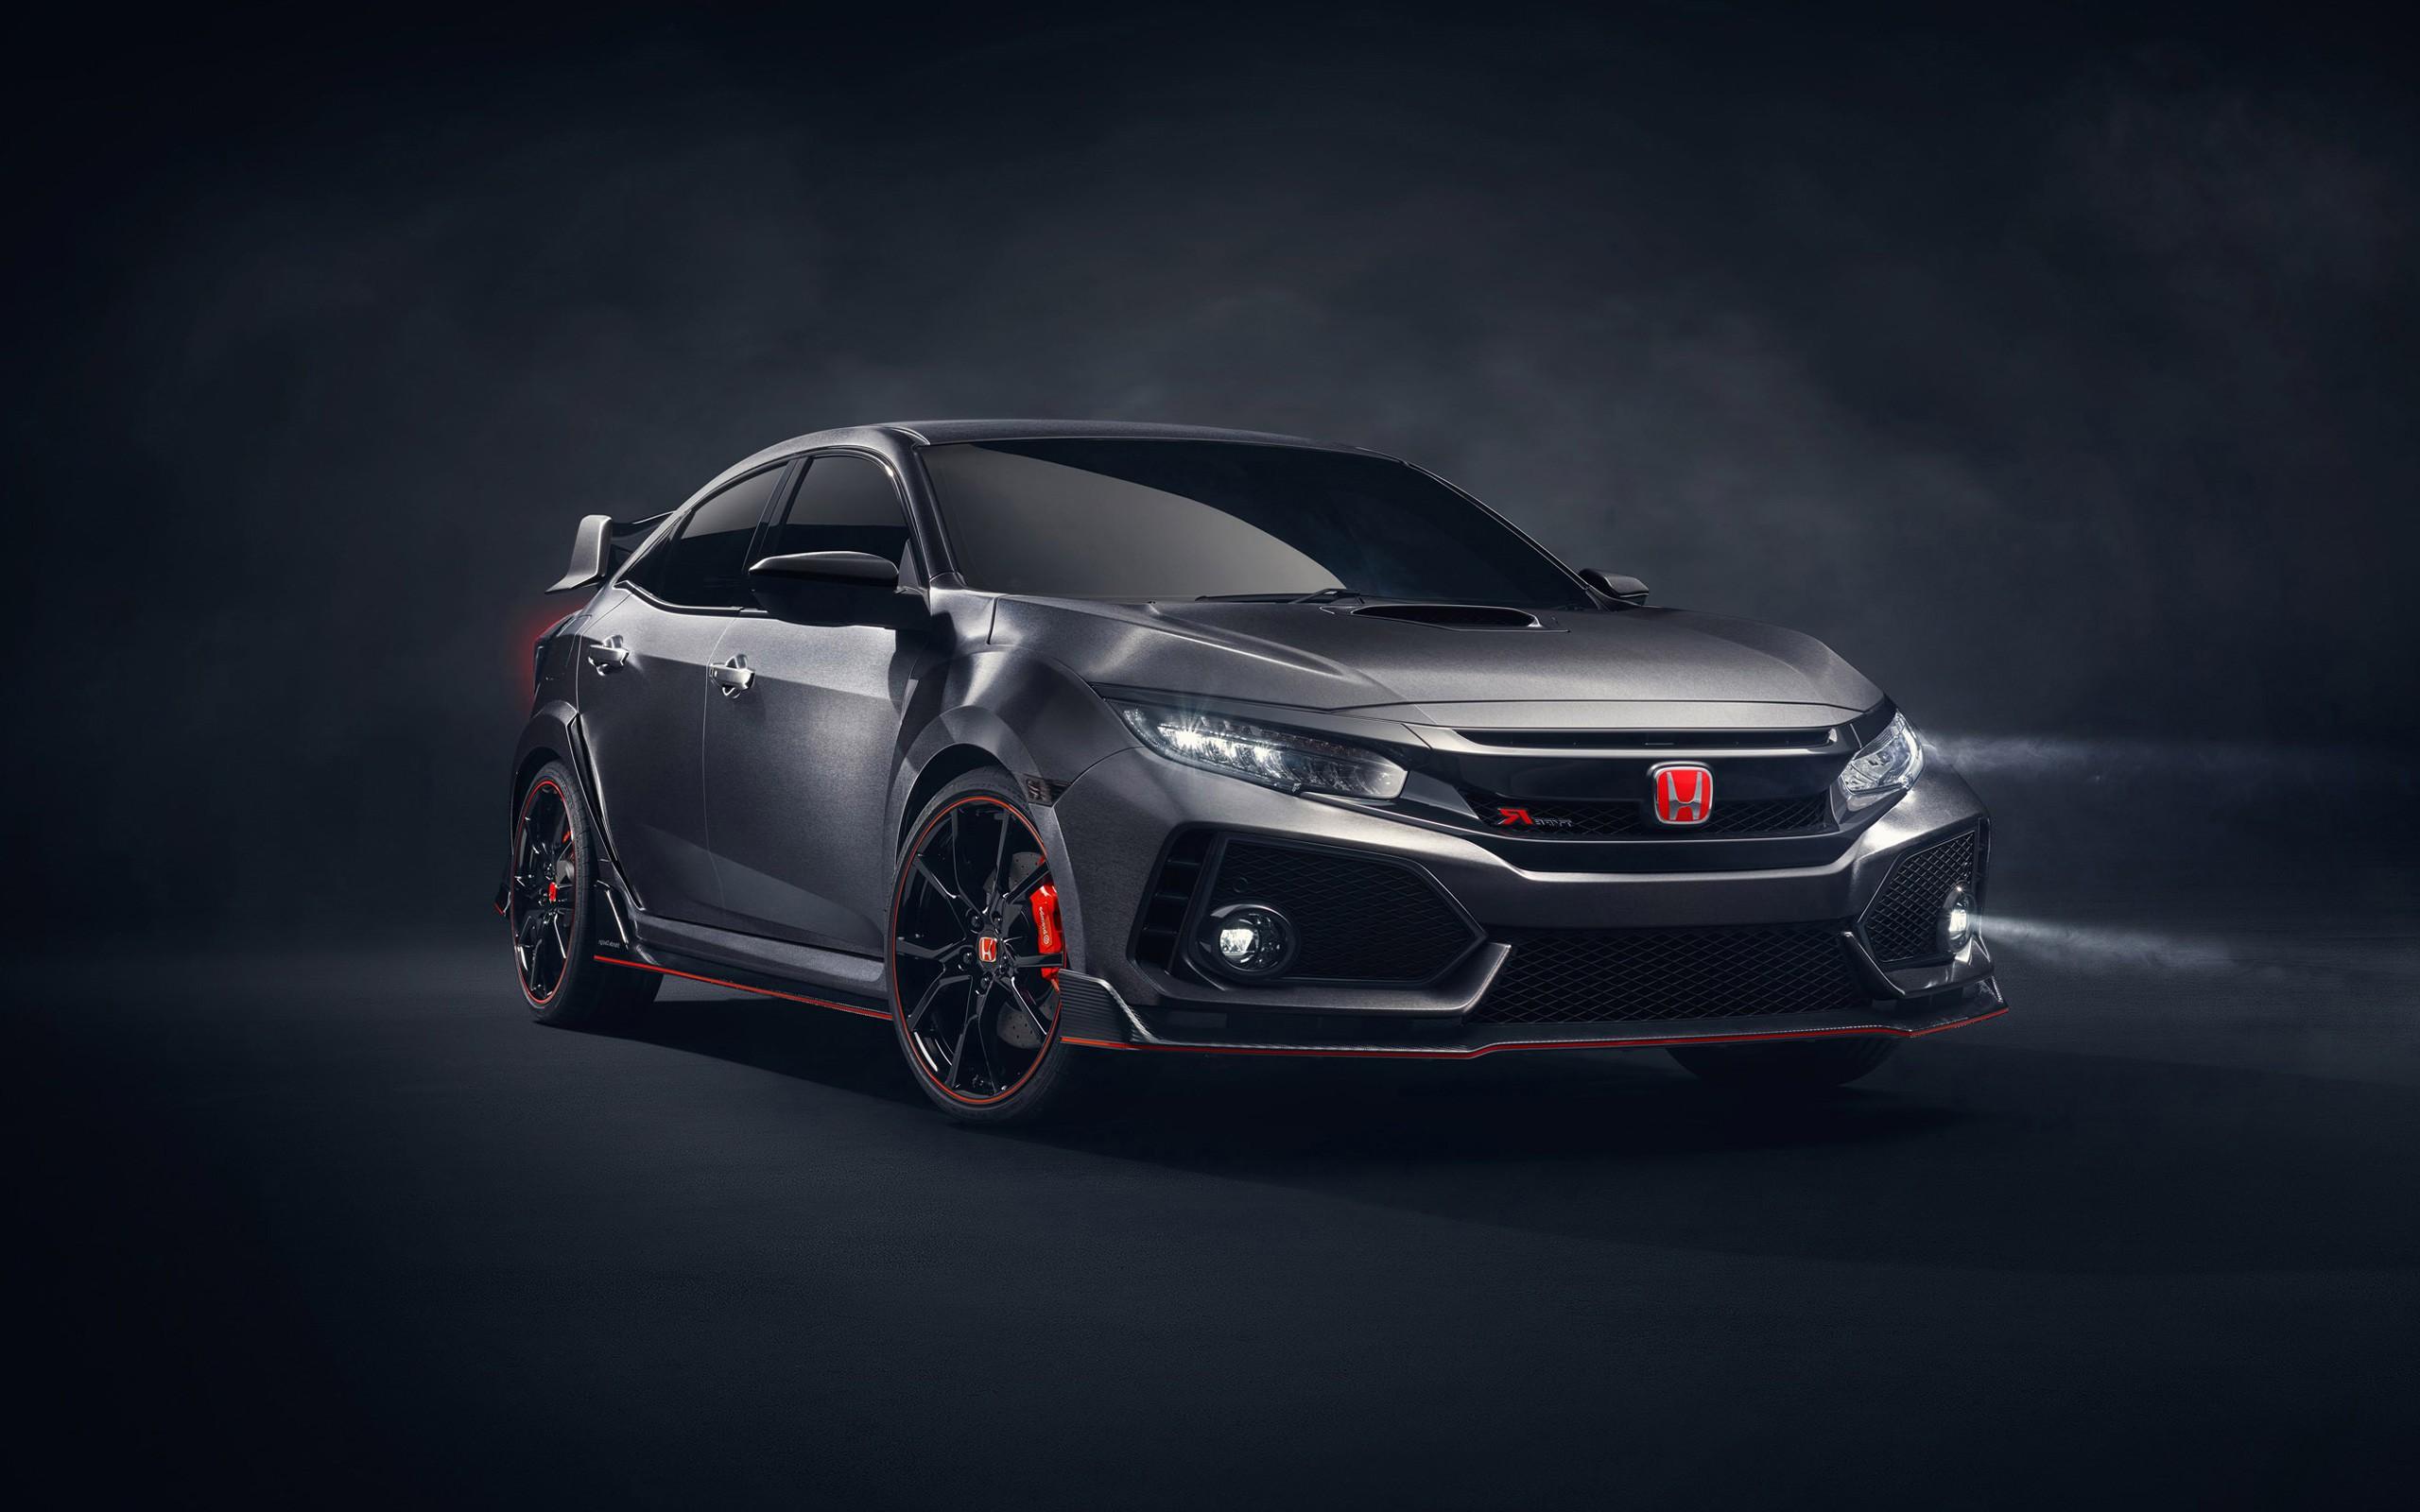 2017 Honda Civic Type R Black Car   New HD Wallpapers 2560x1600